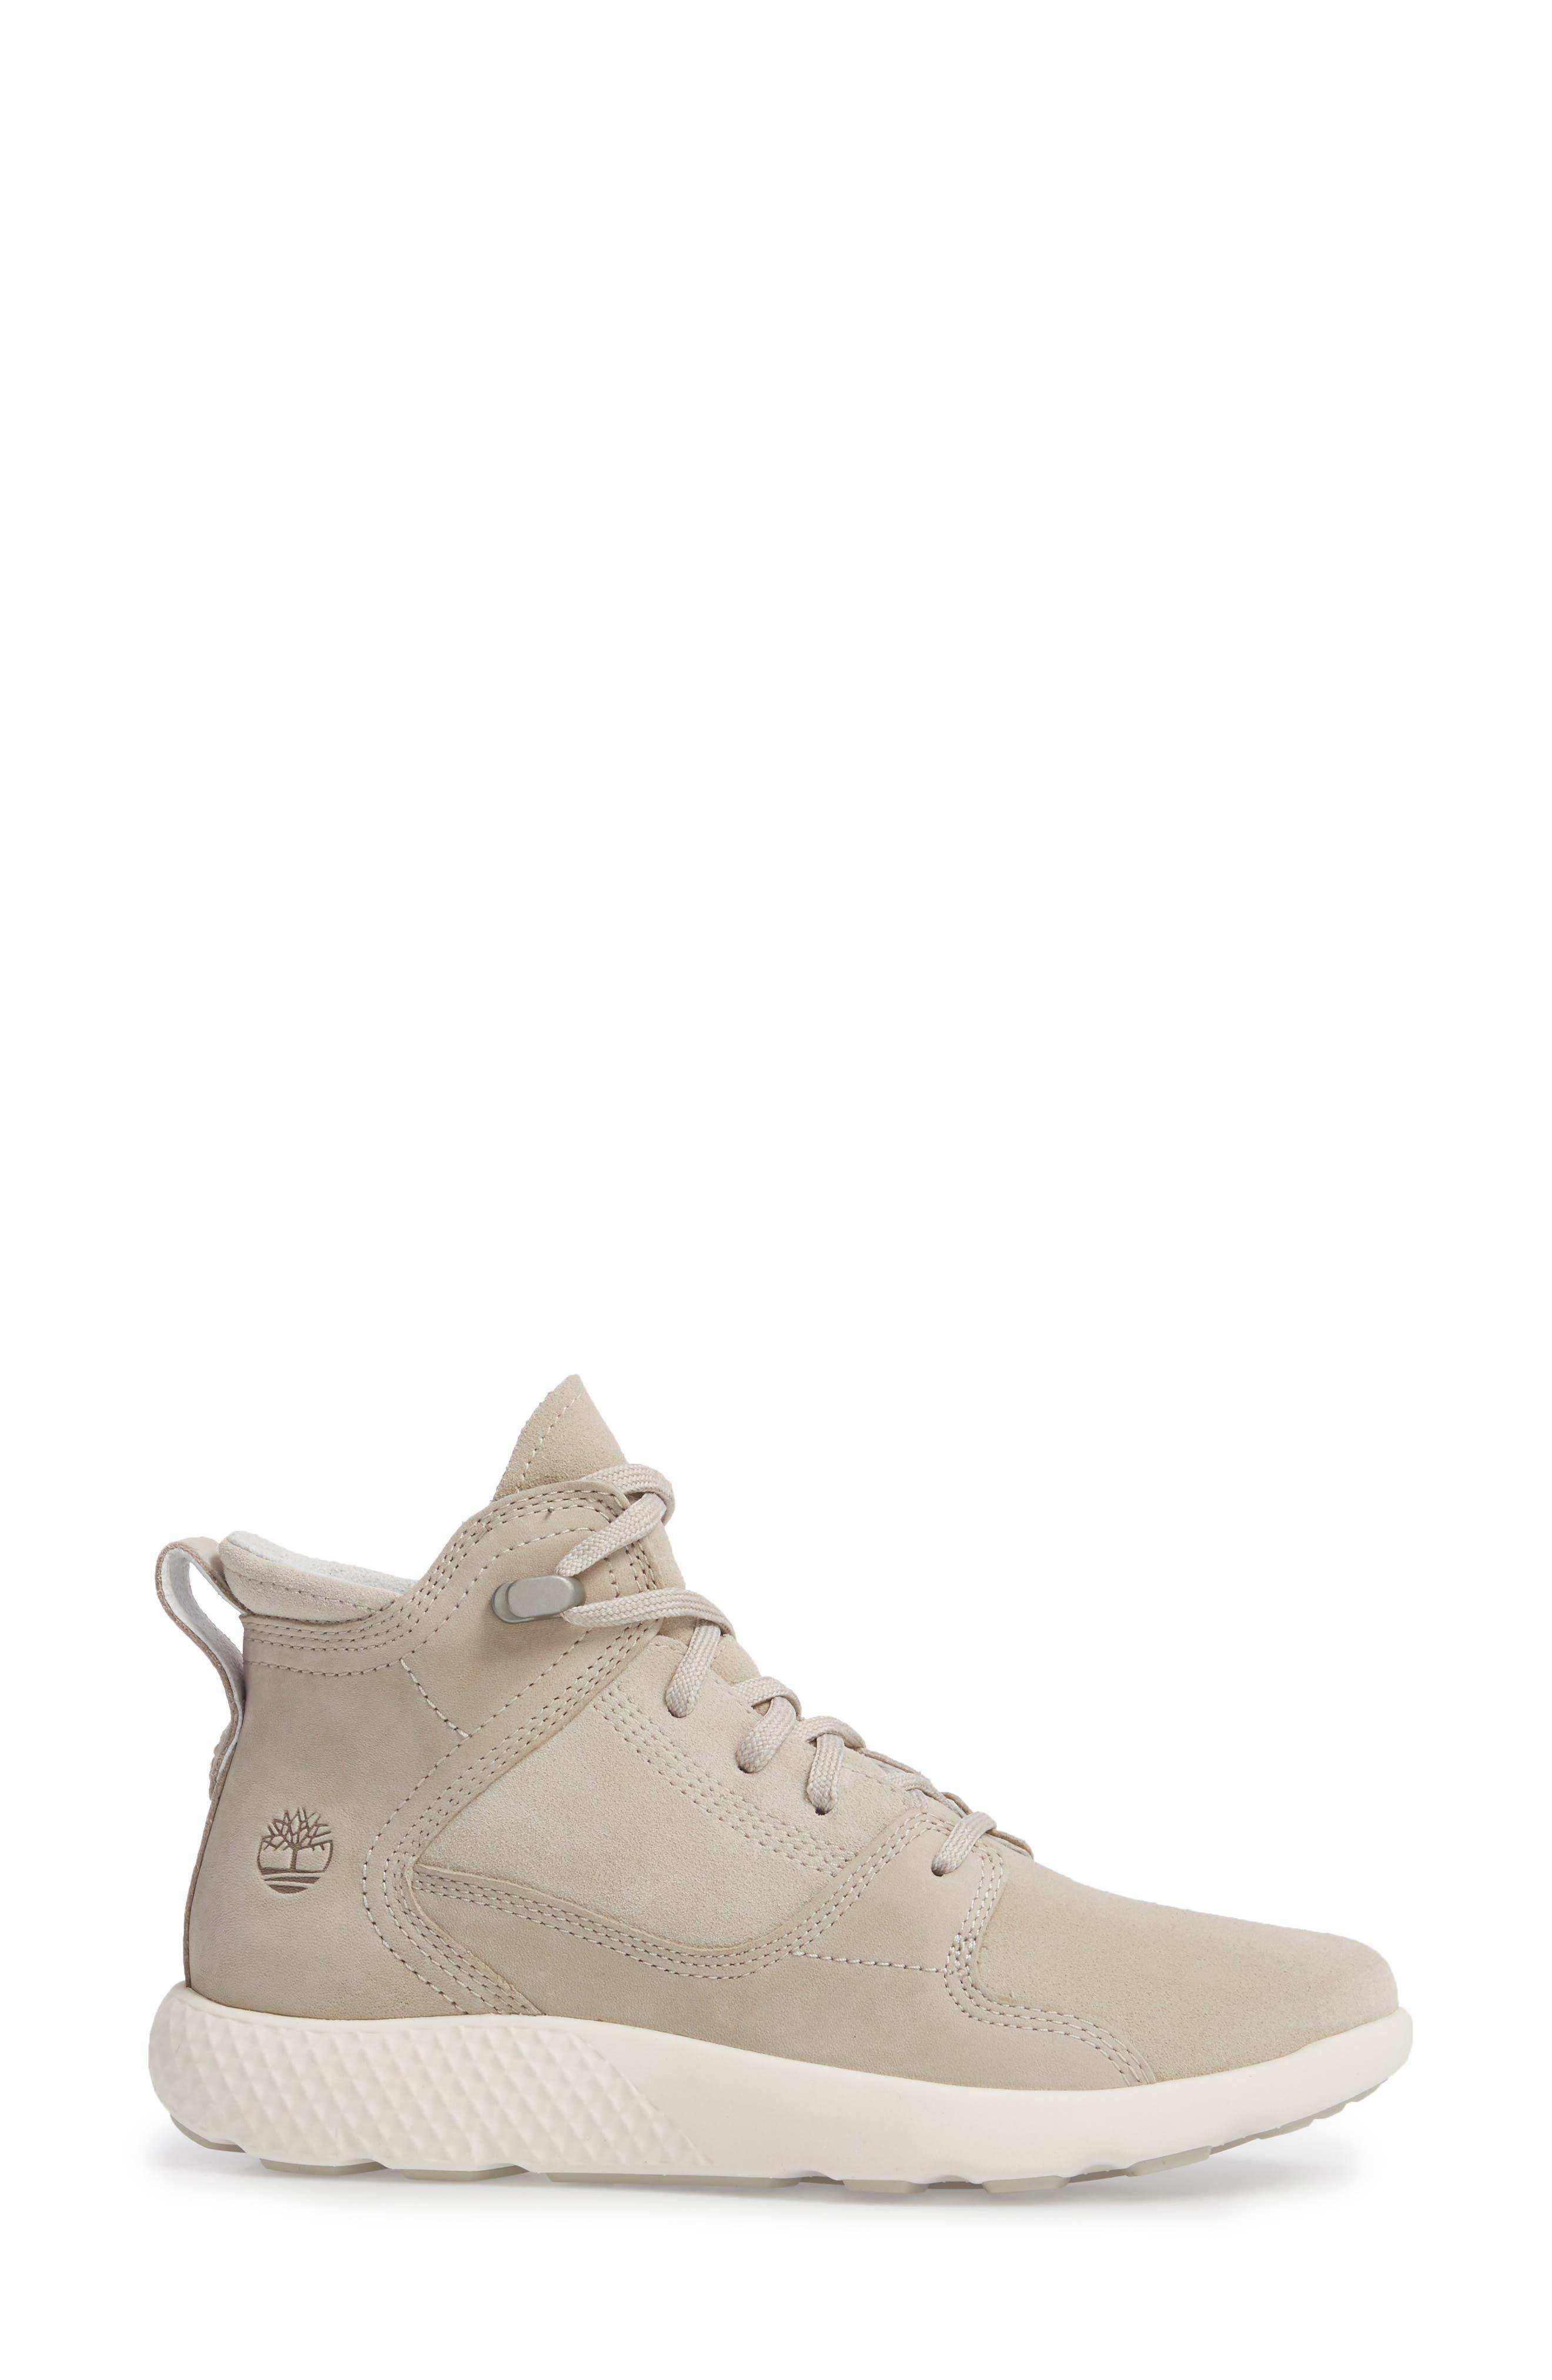 FlyRoam Sneaker,                             Alternate thumbnail 3, color,                             Pure Cashmere Leather